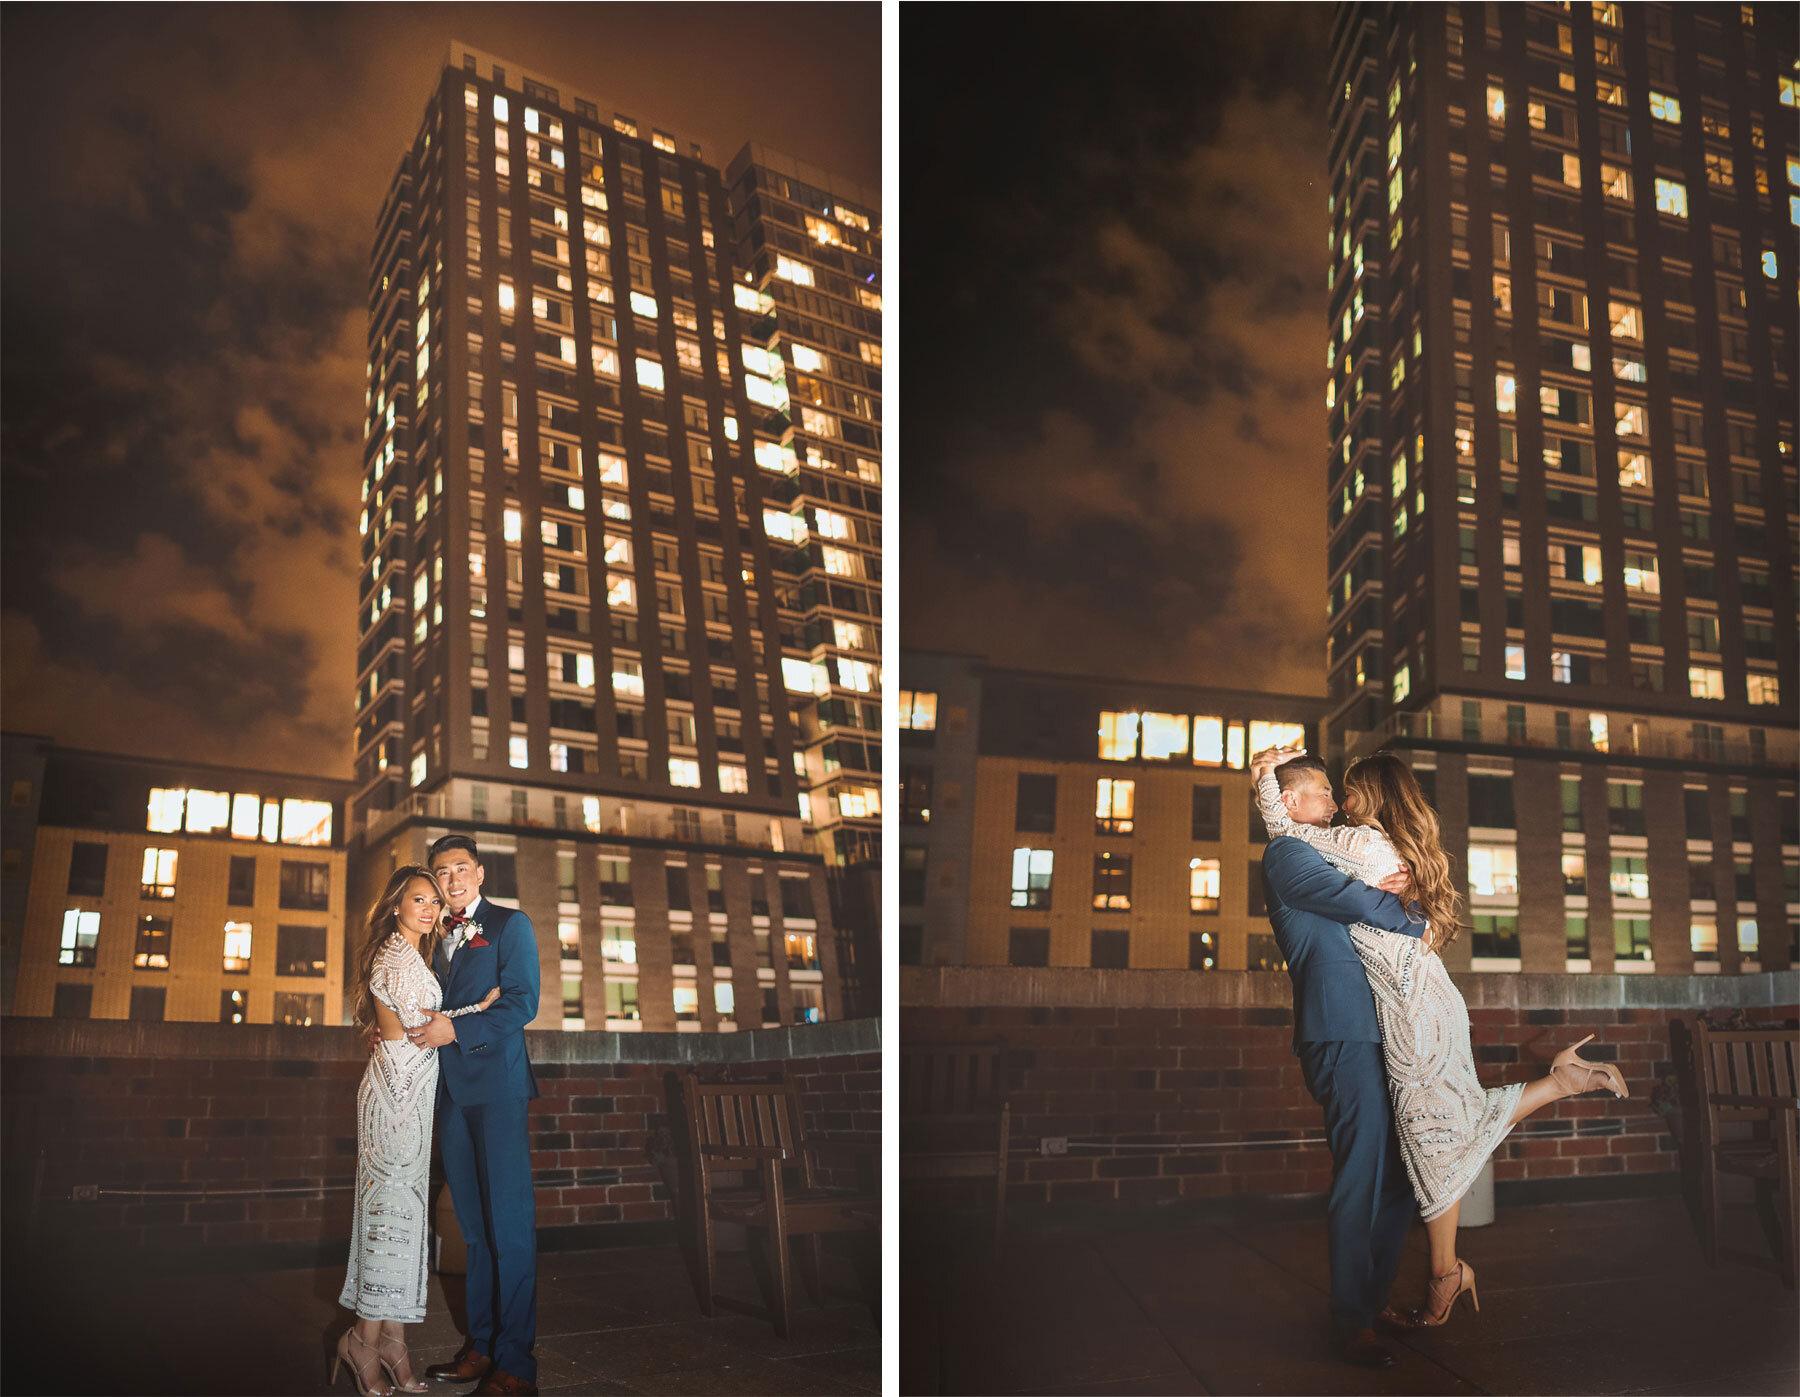 20-Vick-Photography-Minneapolis-Minnesota-The-Graduate-Hotel-Exterior-Night-Bride-Groom-Kiss-Skyline-Mai-&-Ross.jpg